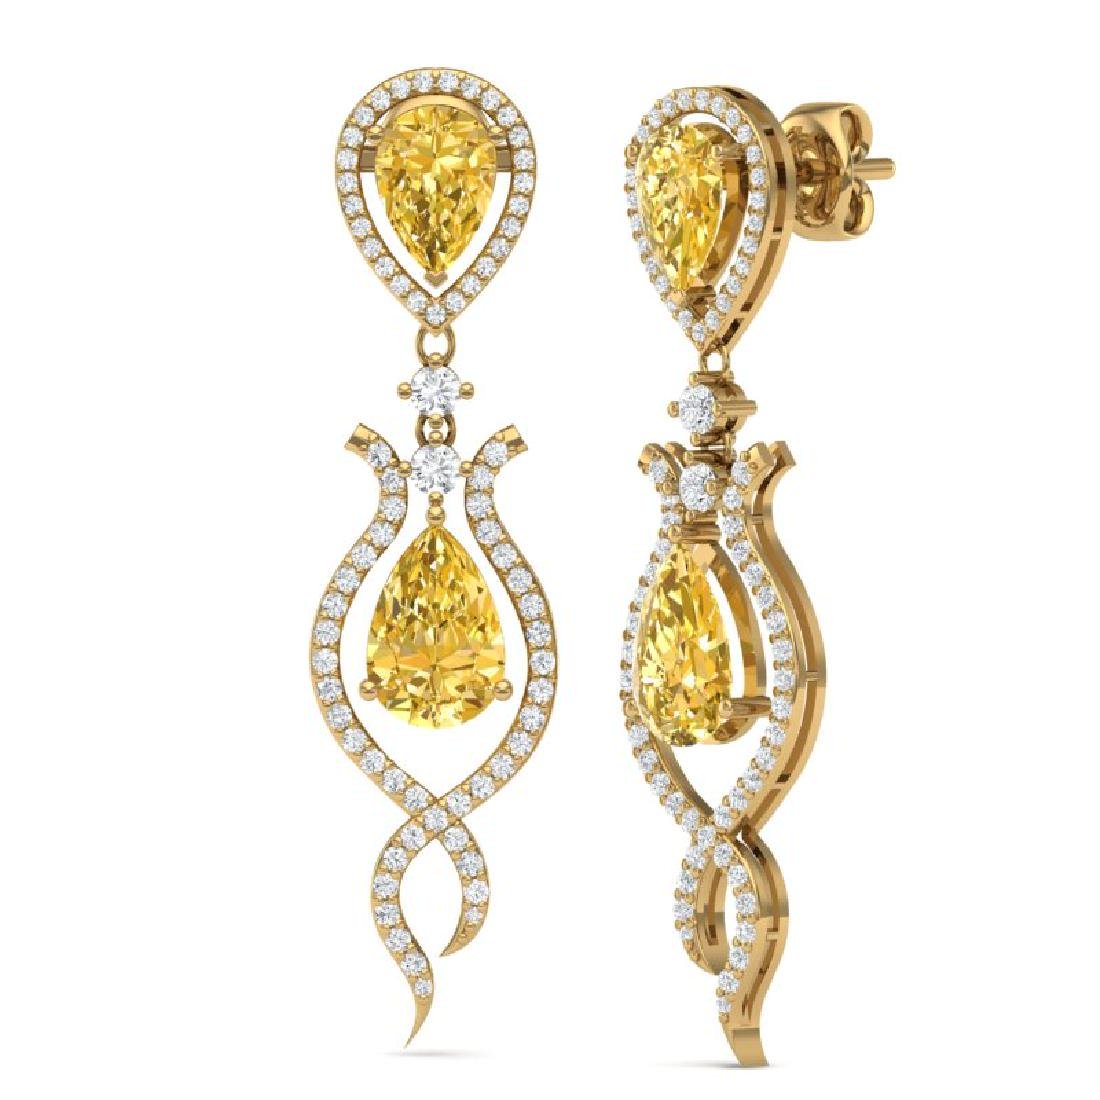 14.09 CTW Royalty Canary Citrine & VS Diamond Earrings - 2